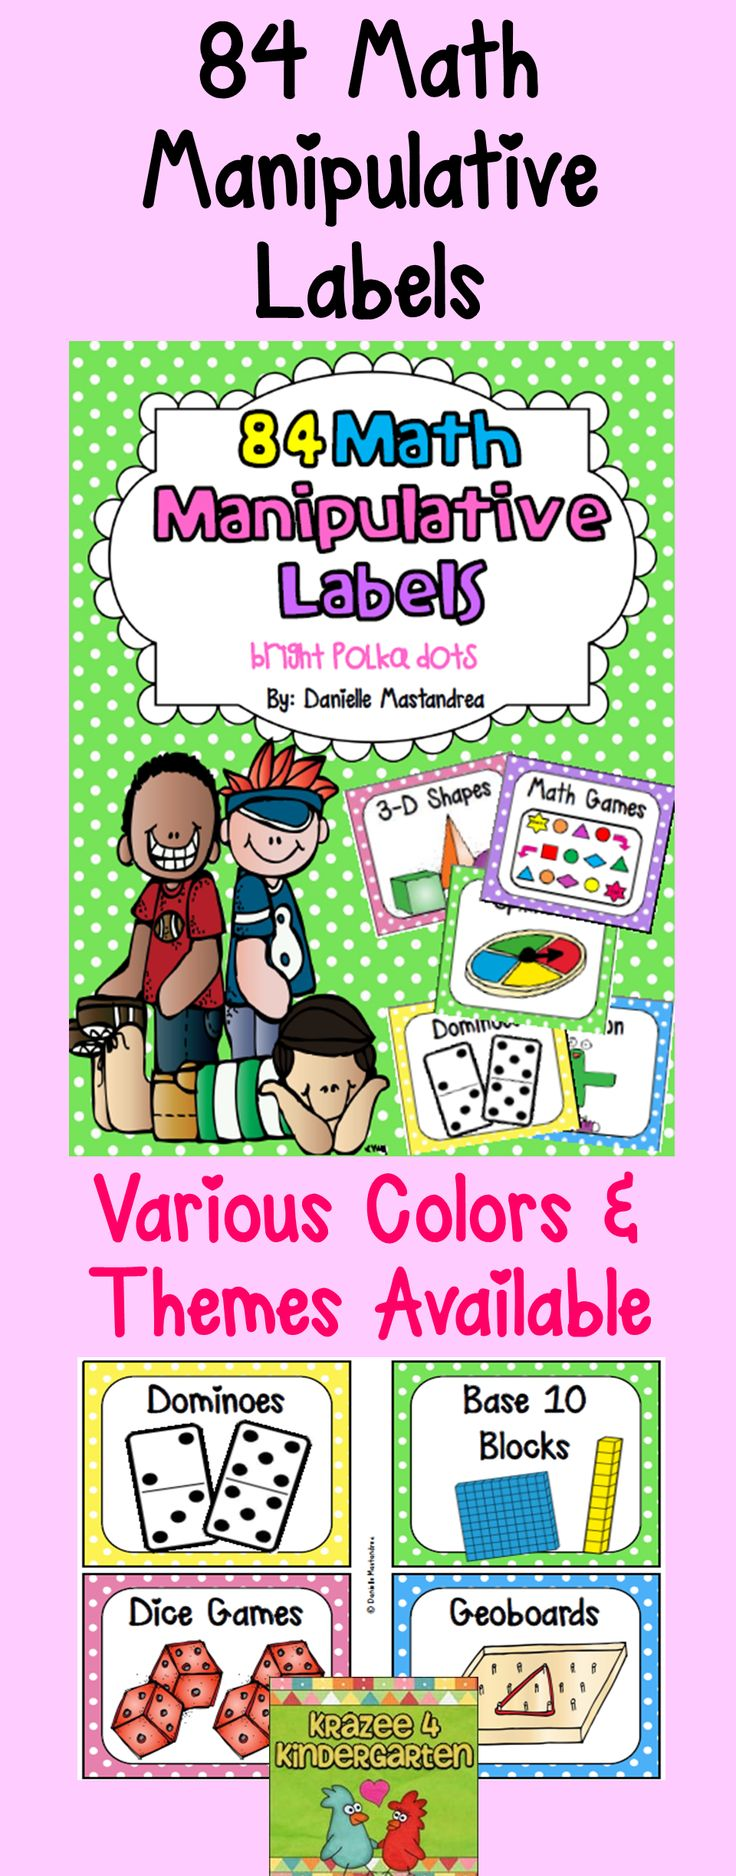 84 Math Manipulative Labels